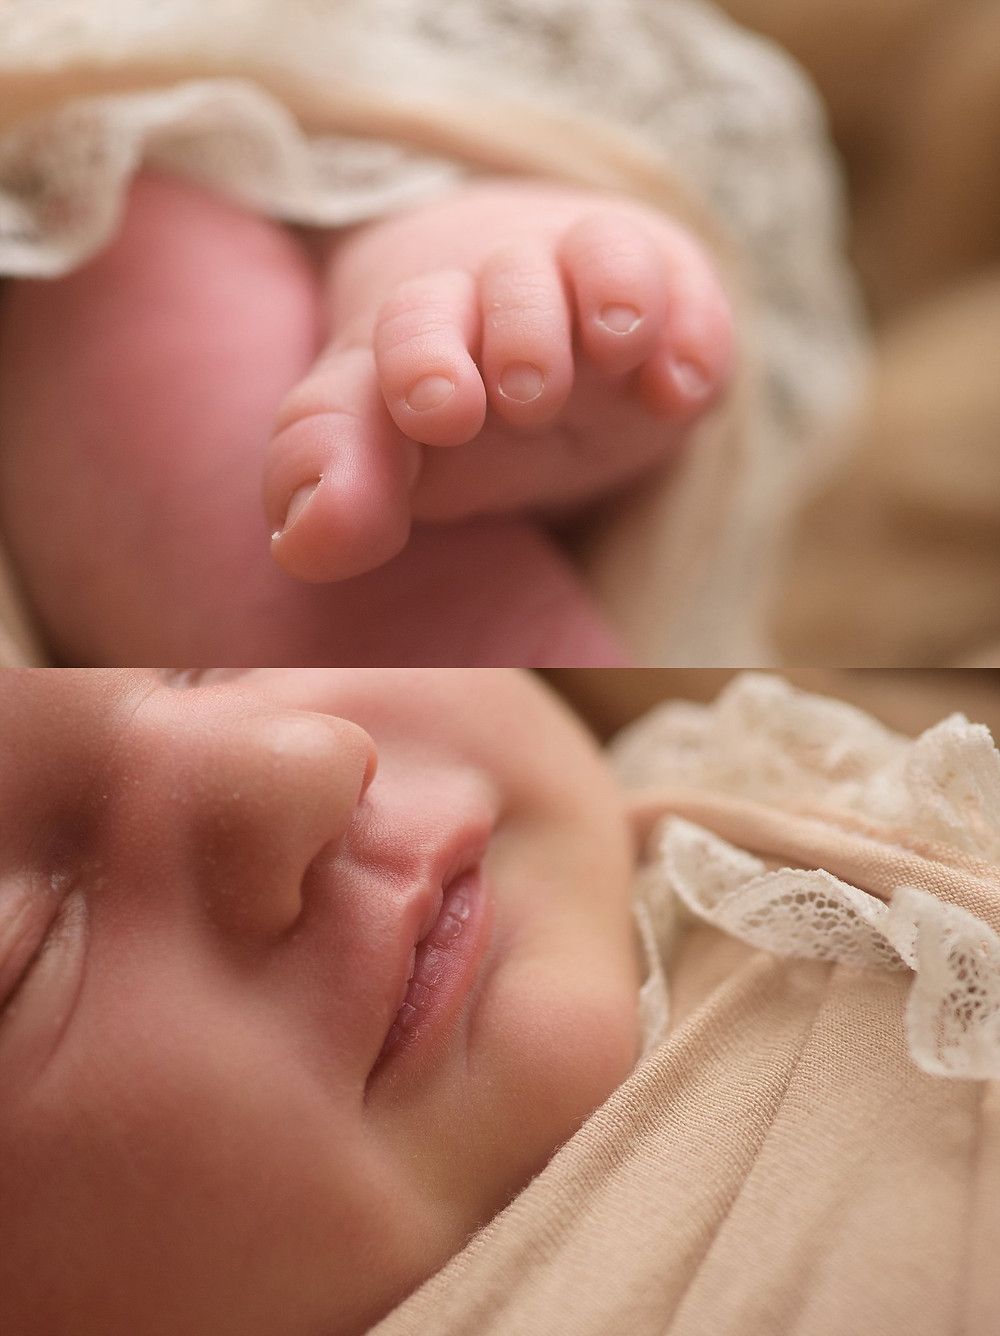 newborn details, Sidney BC Newborn Photographer, Victoria BC Newborn Photographer, Fawn Lily Photography, Vancouver Island BC, Photographer